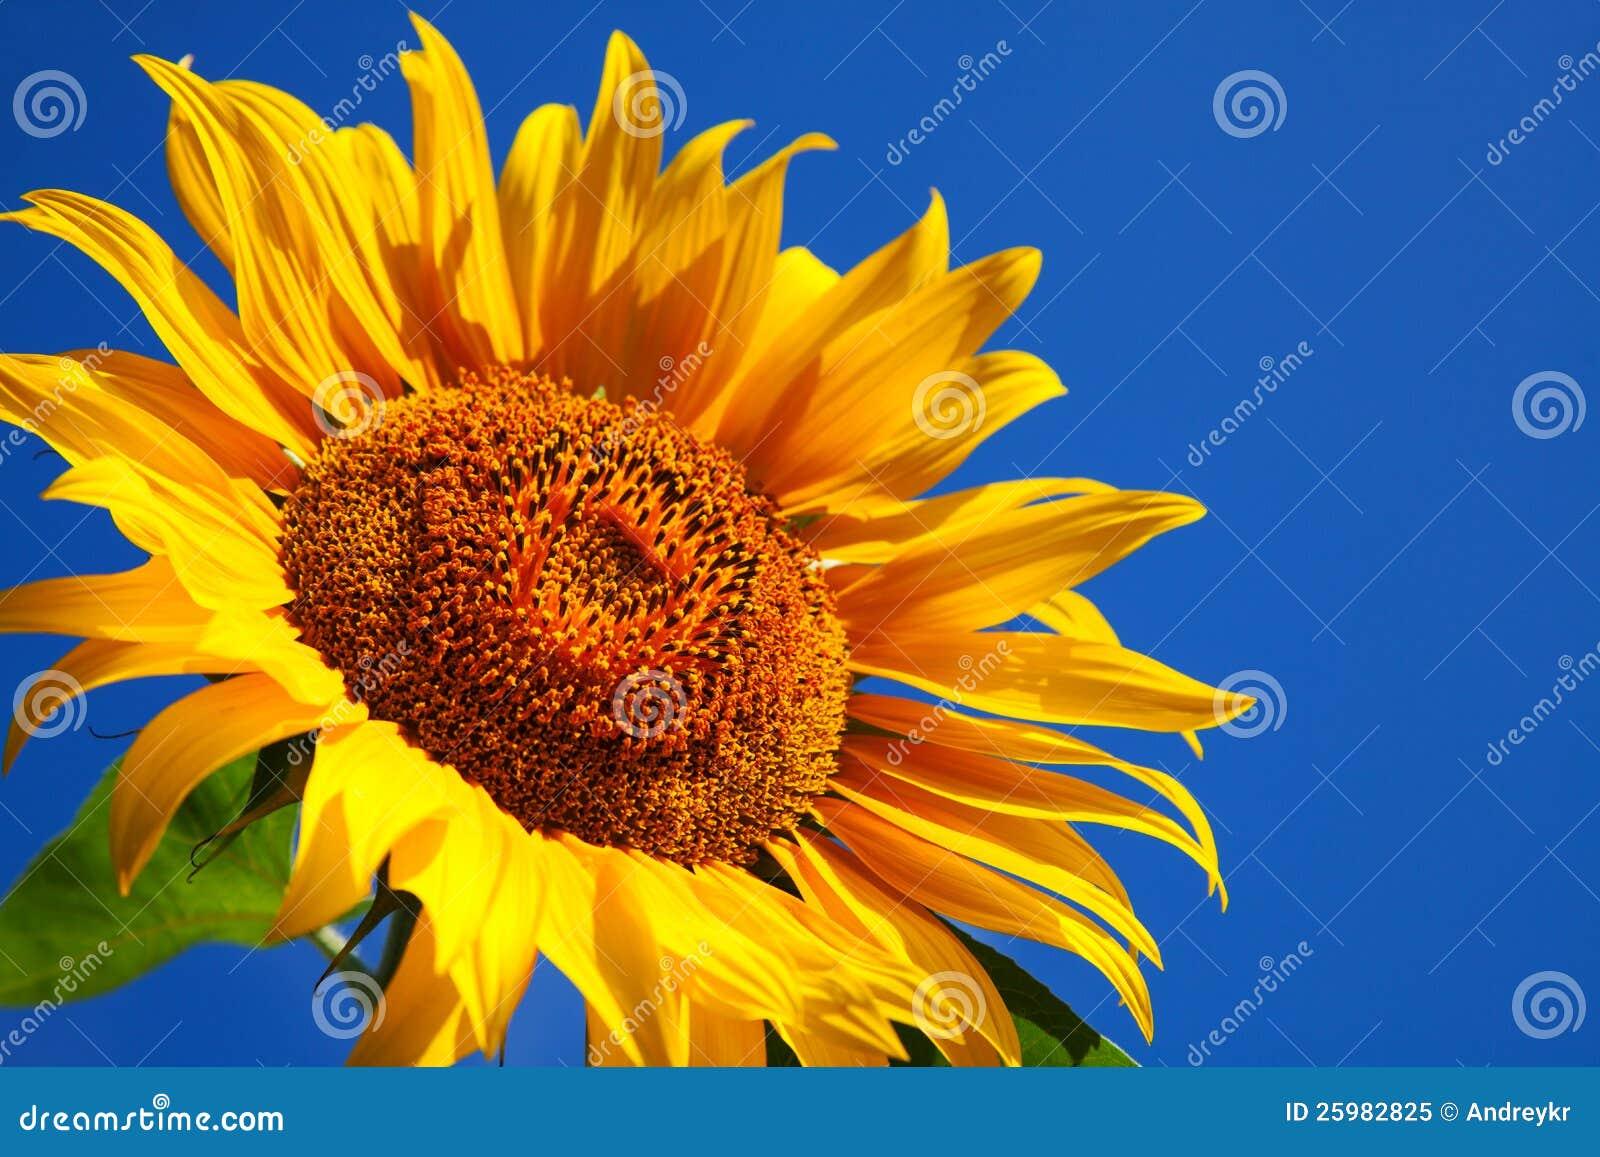 Sunflower head s close up